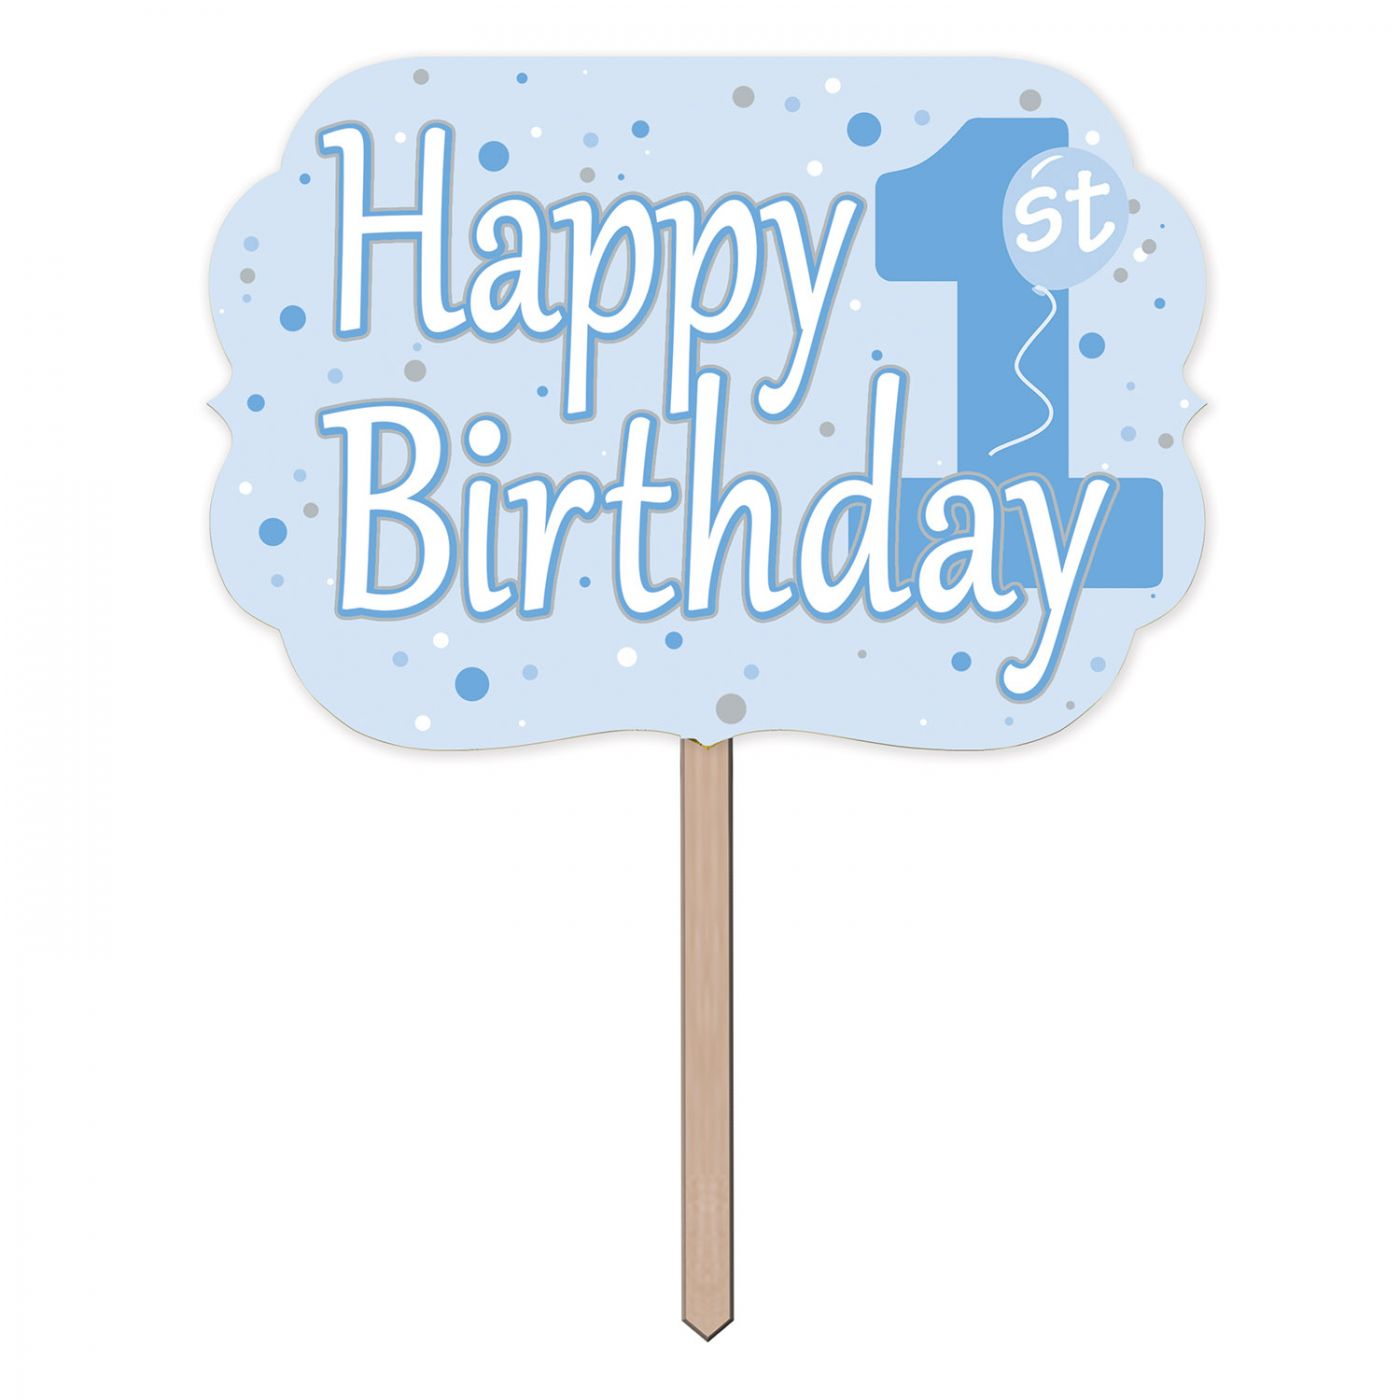 1st Birthday Yard Sign image